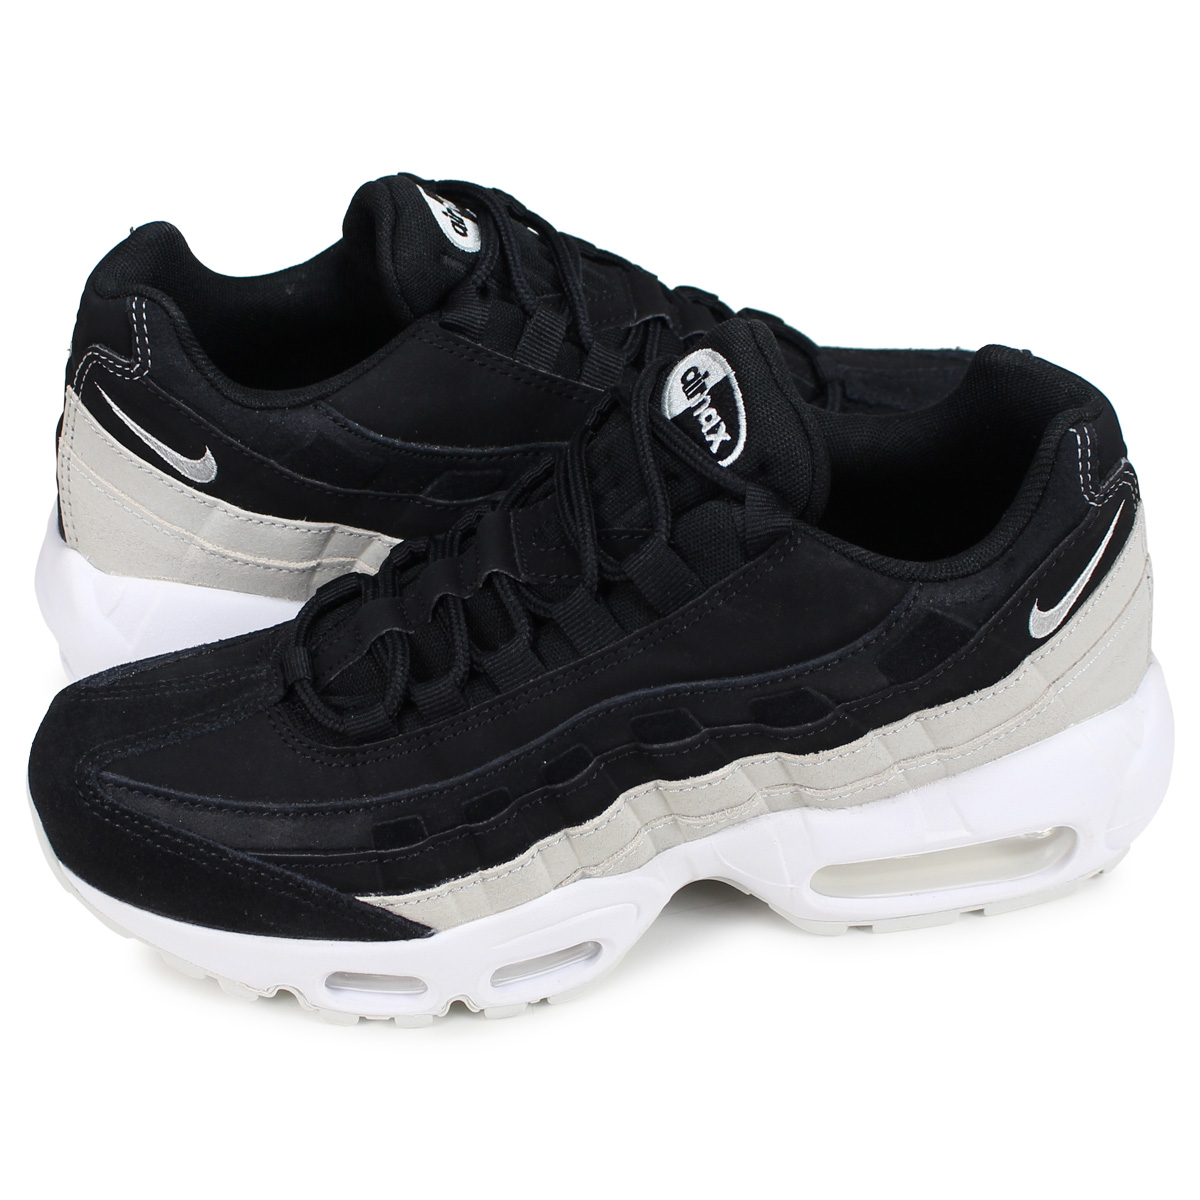 814e8320 Nike NIKE Air Max 95 sneakers Lady's men WMNS AIR MAX 95 PREMIUM black  807,443- ...